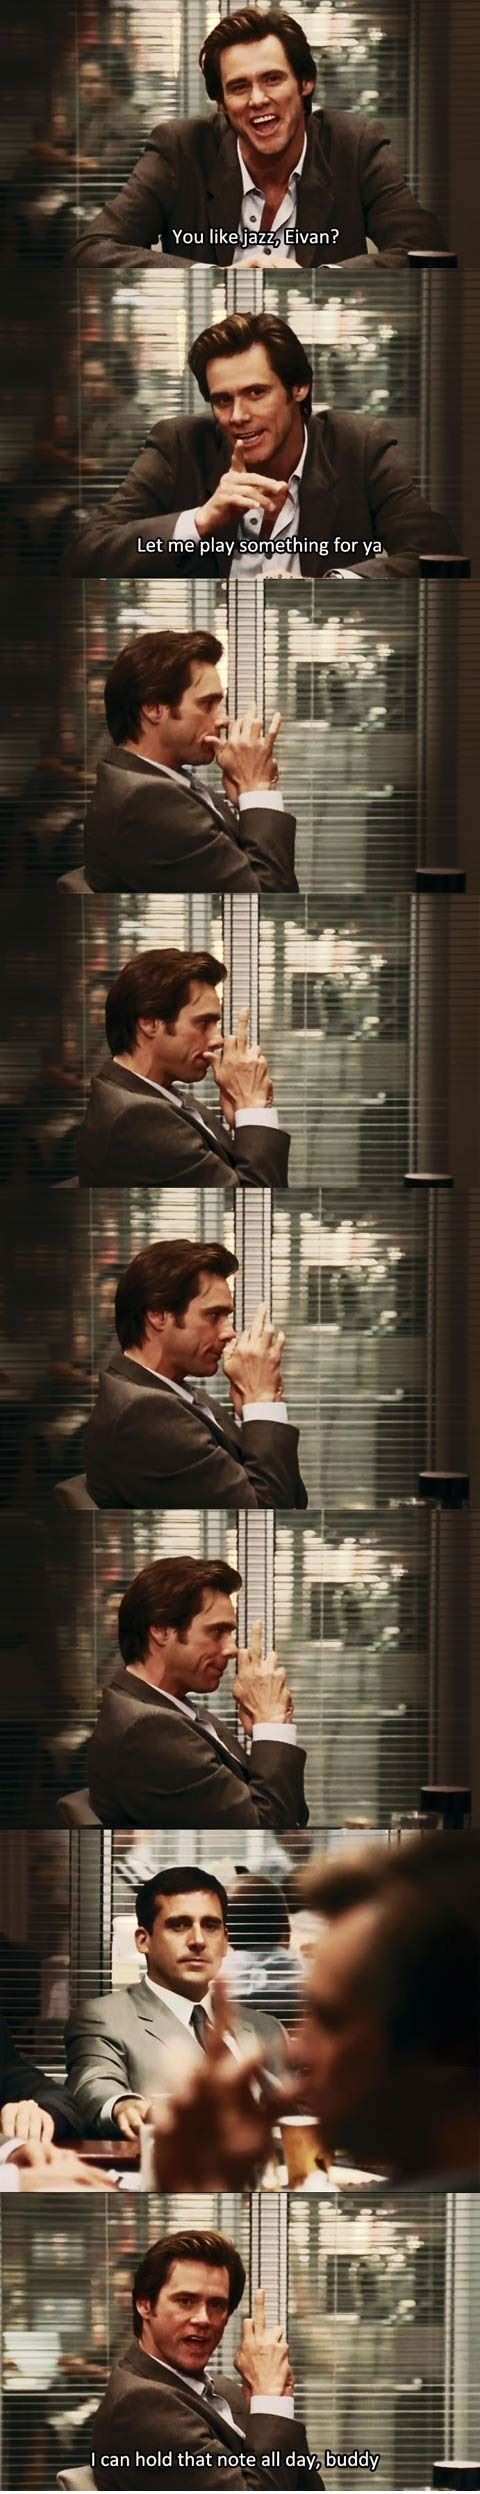 Bruce Almighty (2003) Directed by Tom Shayac. Starring Jim Carrey, Jennifer Aniston, Morgan Freeman